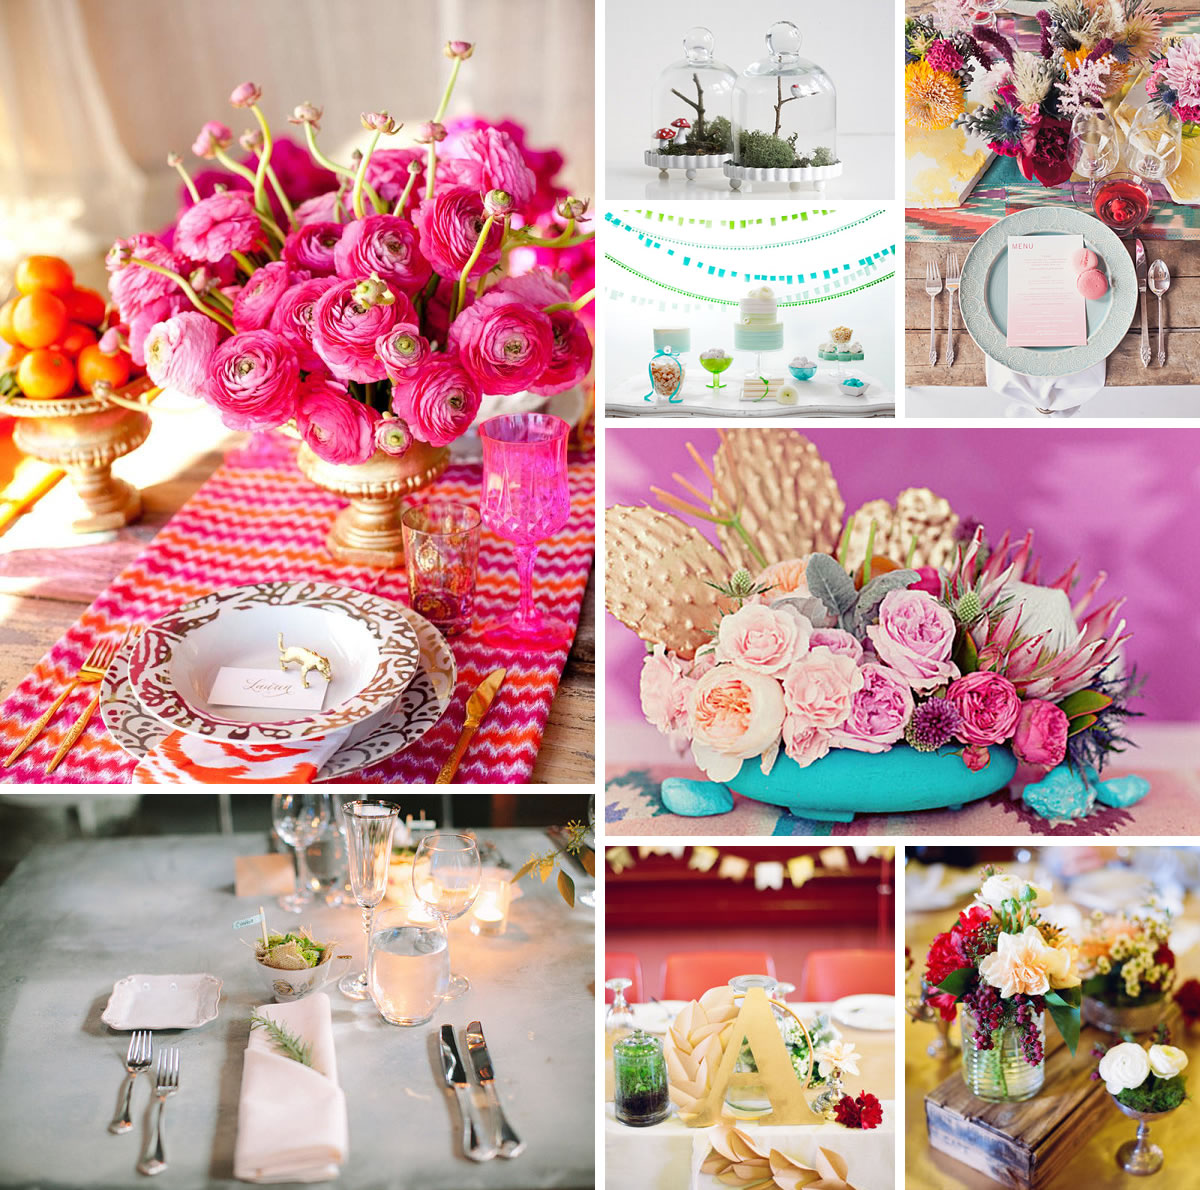 Dekorasi+meja+pernikahan Dekorasi meja pernikahan